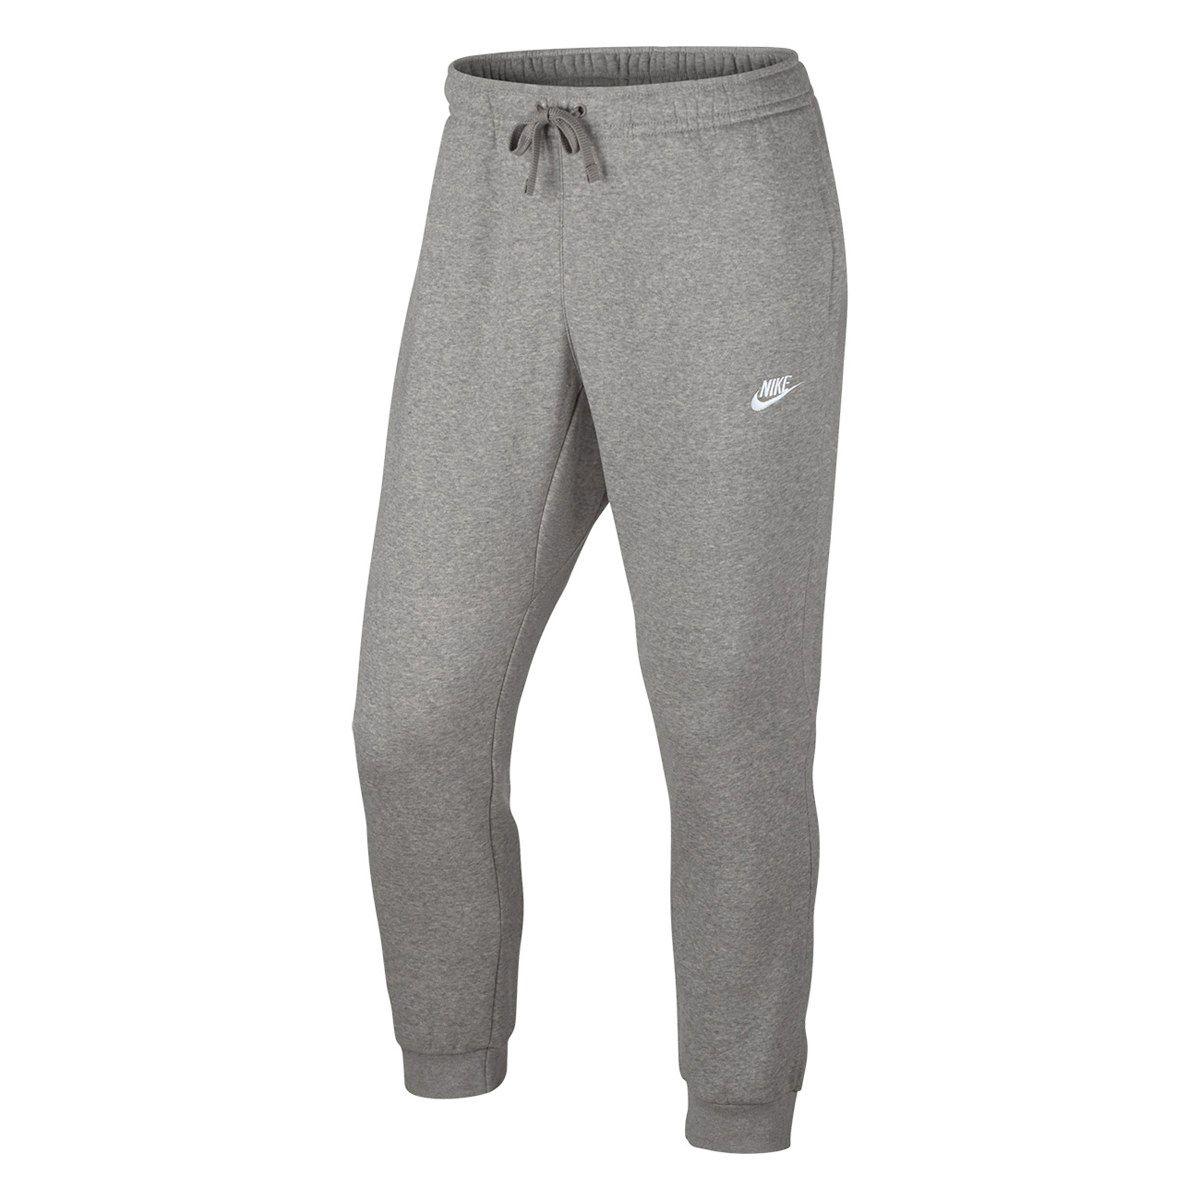 00b4e1112c Calça Masc Nike Sportswear Jogger Club Fleece - BRACIA SHOP  Loja de ...